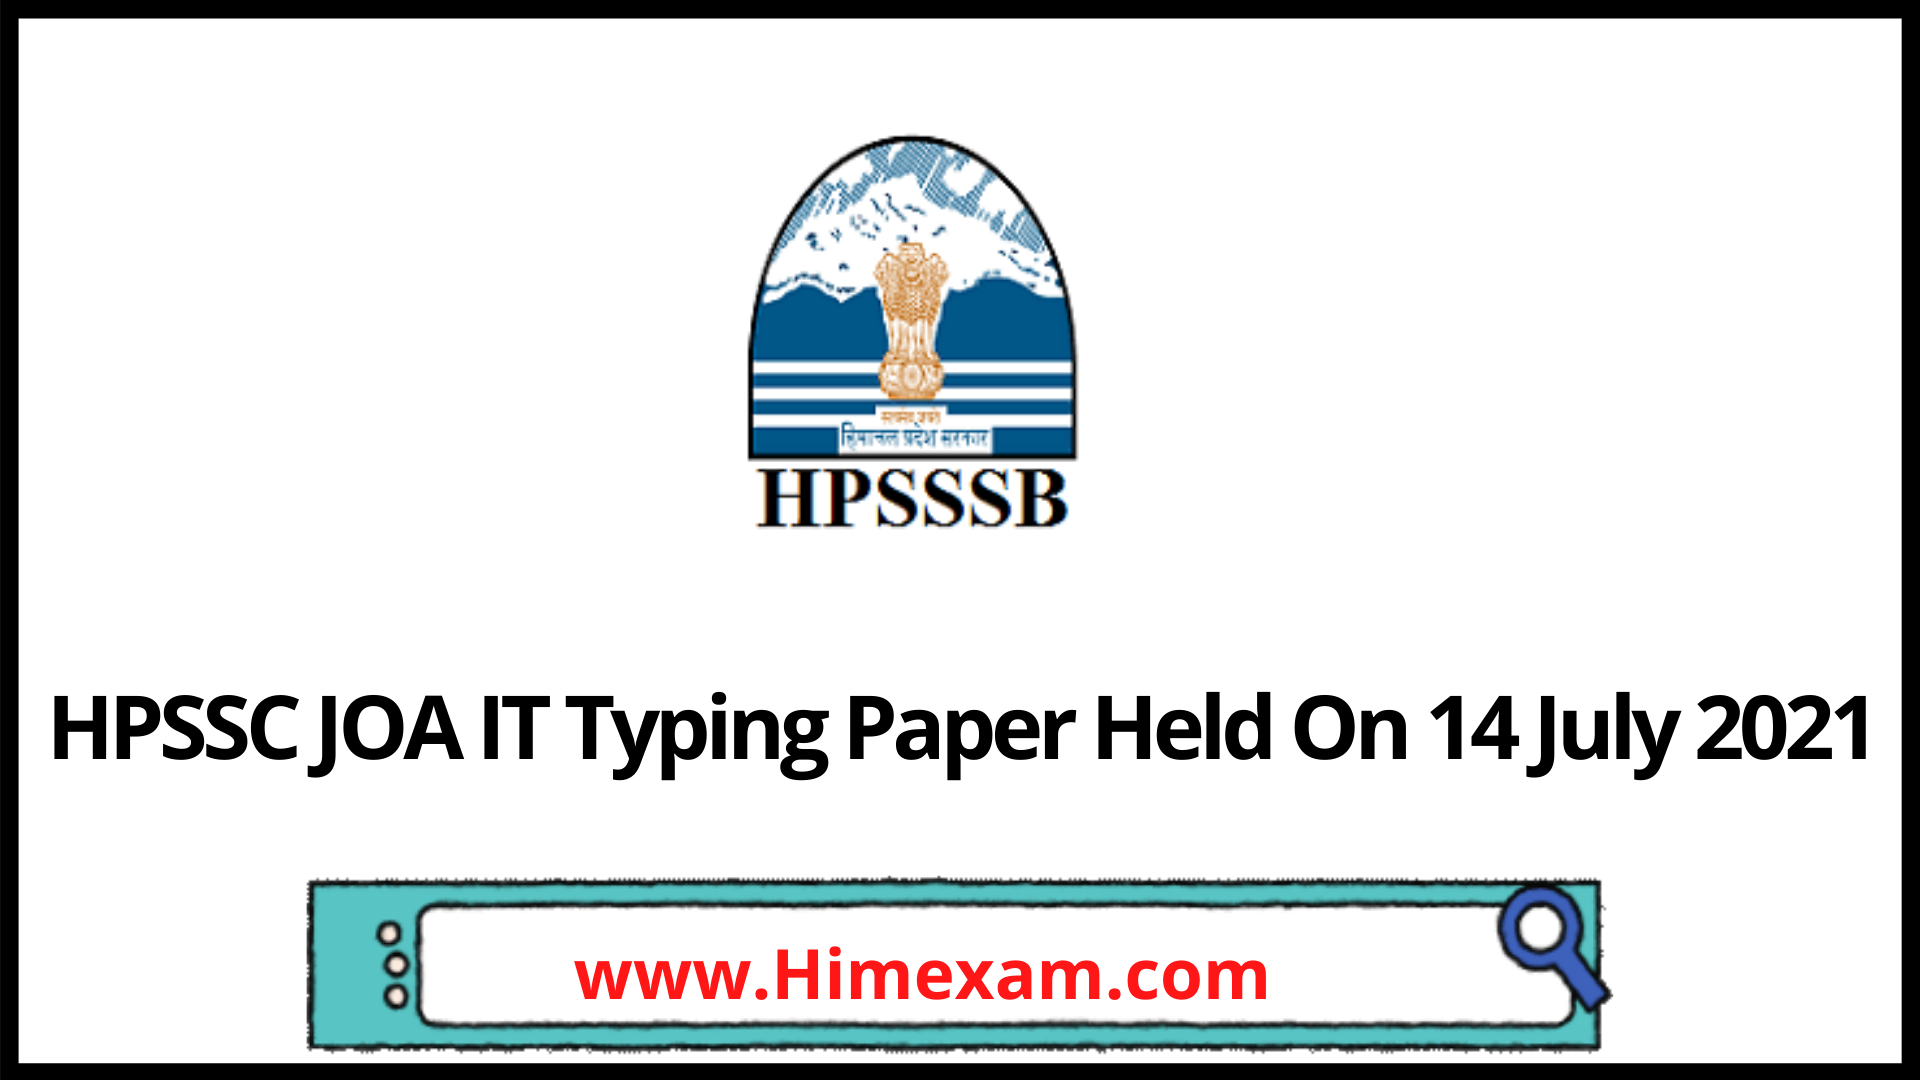 HPSSC JOA IT Typing Paper Held On 14 July 2021